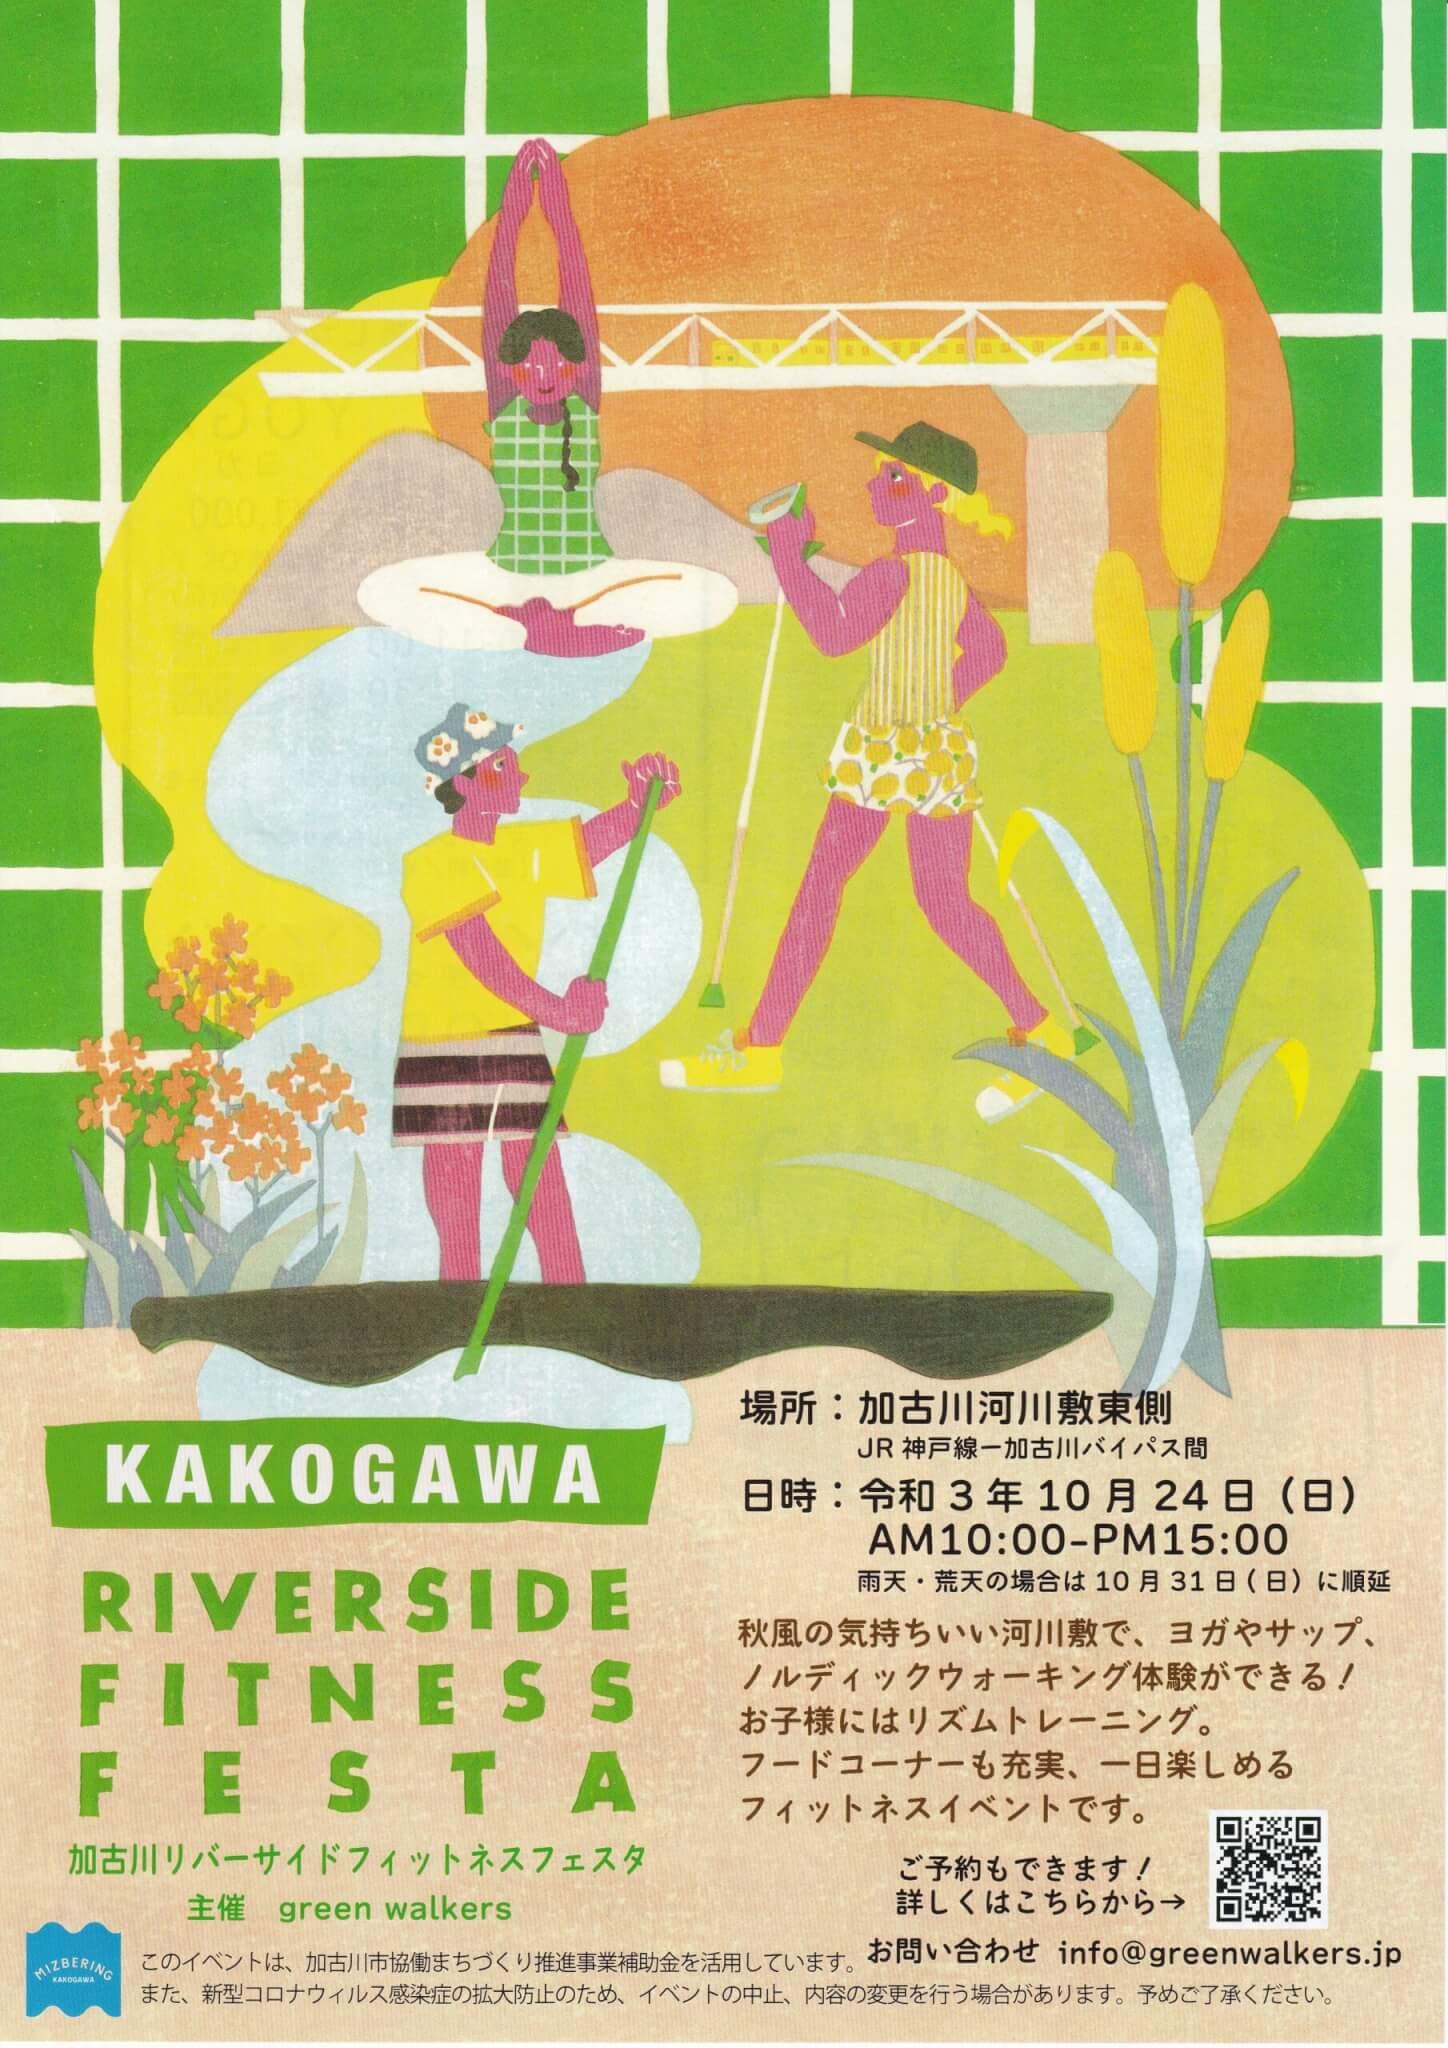 KAKOGAWA RIVERSIDE FITNESS FESTA(加古川リバーサイドフィットネスフェスタ)チラシ表